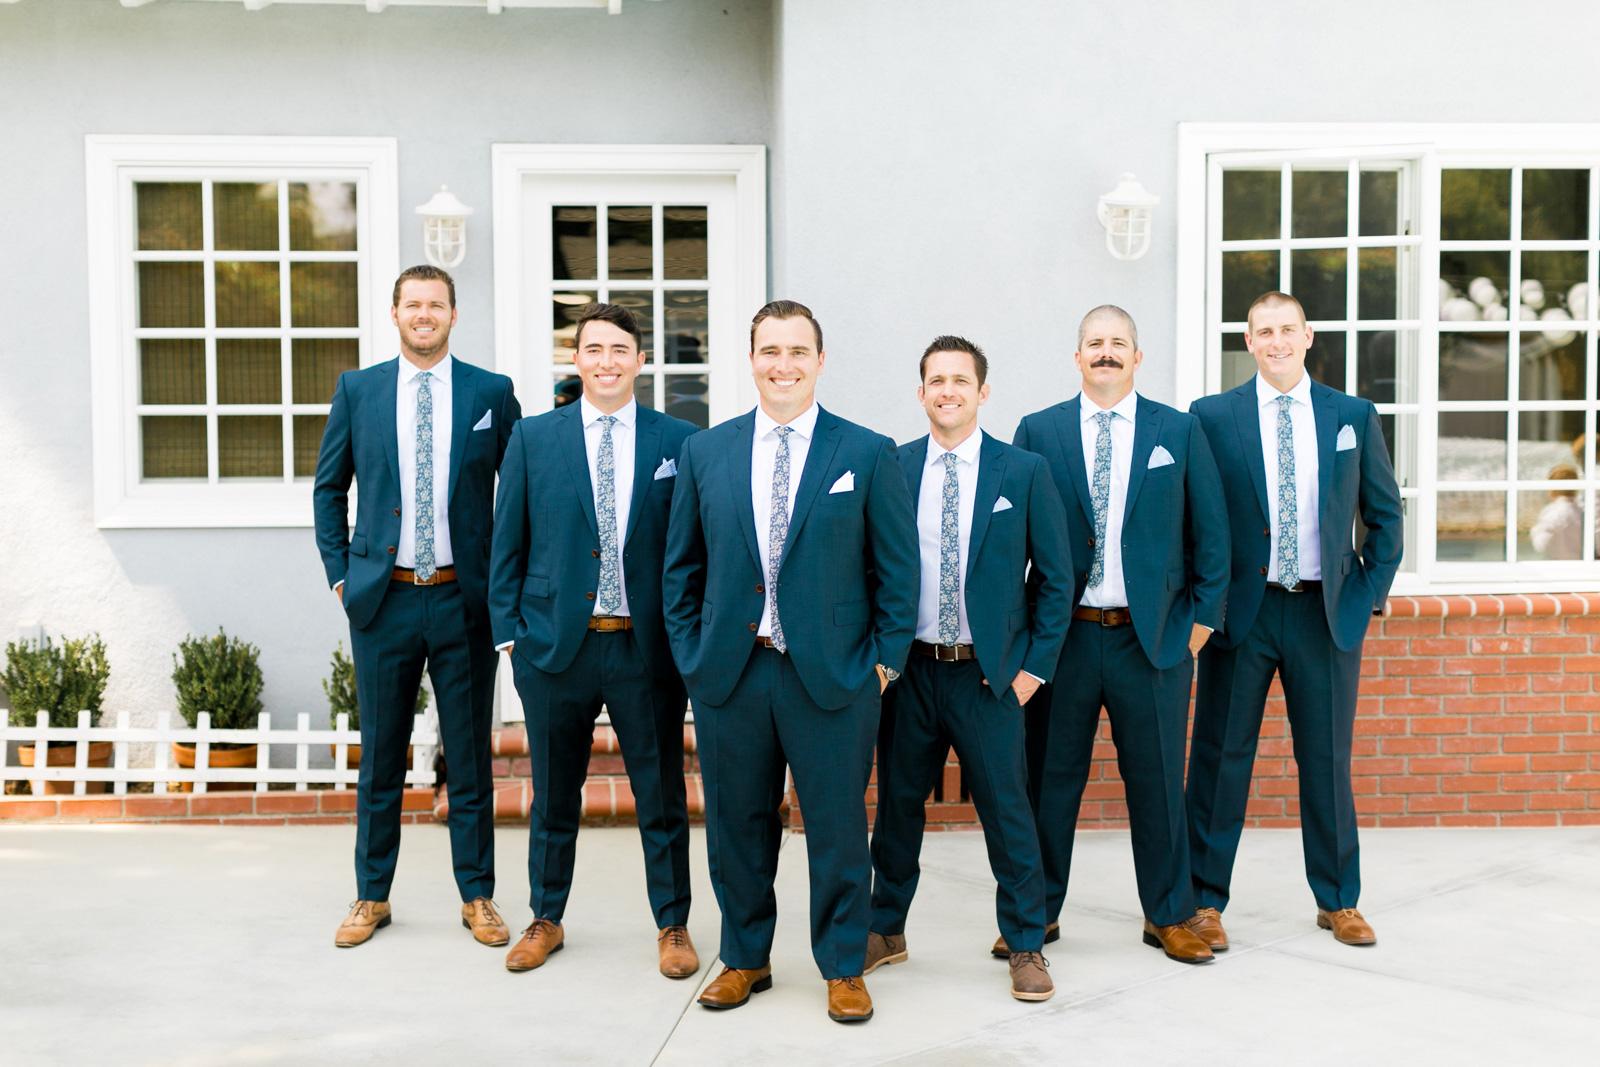 Southern-California-Wedding-Photographer-Natalie-Schutt-Photography_09.jpg